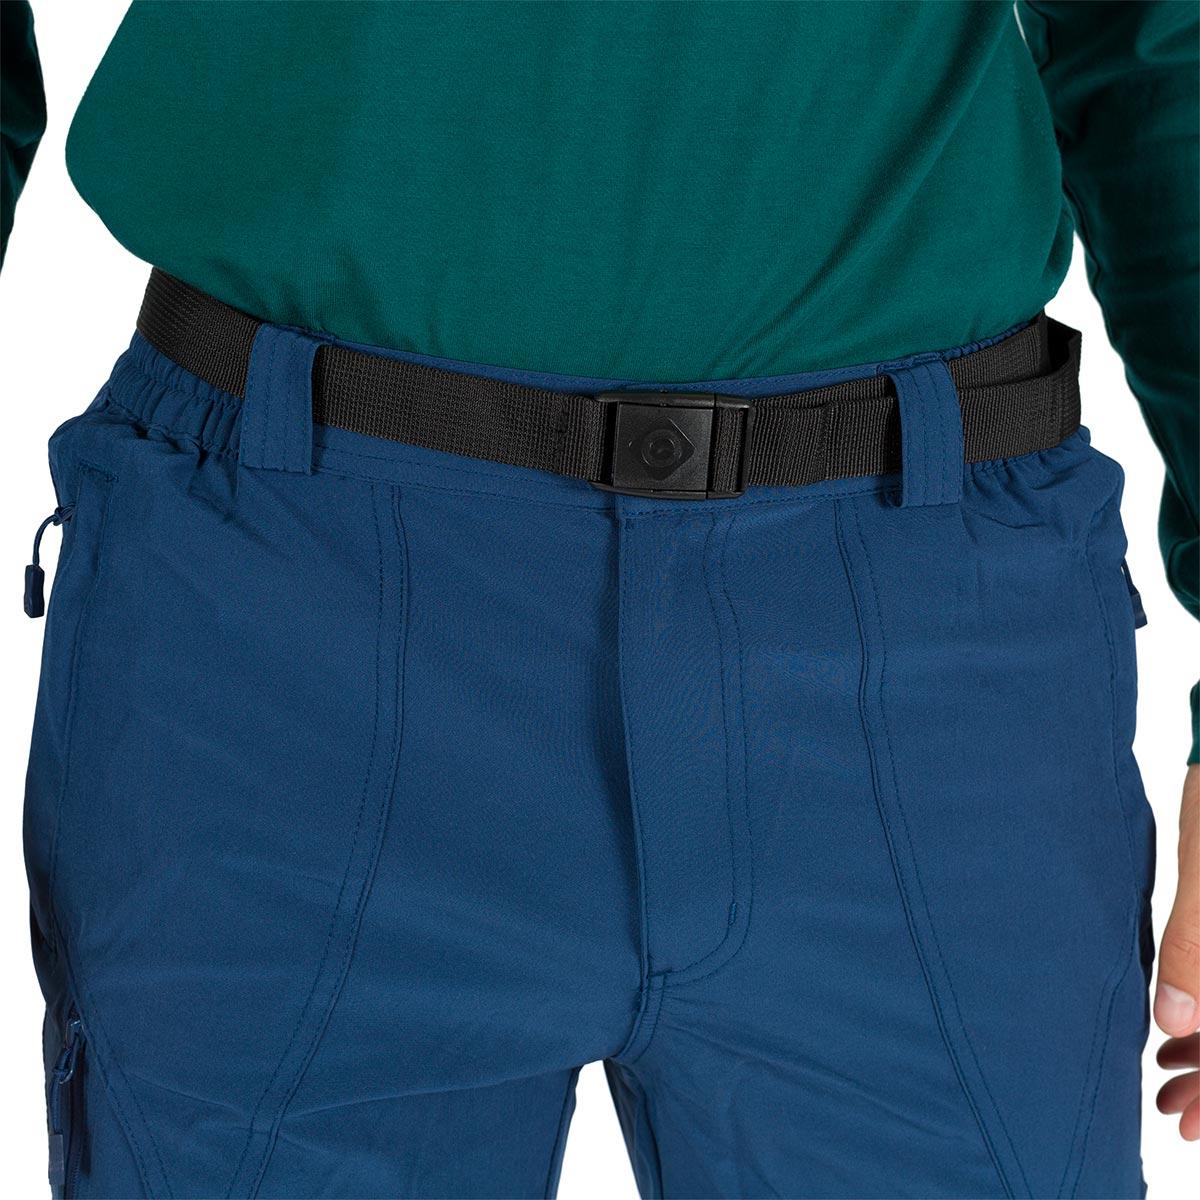 MAN'S BEAR STRETCH SHORT PANT BLUE